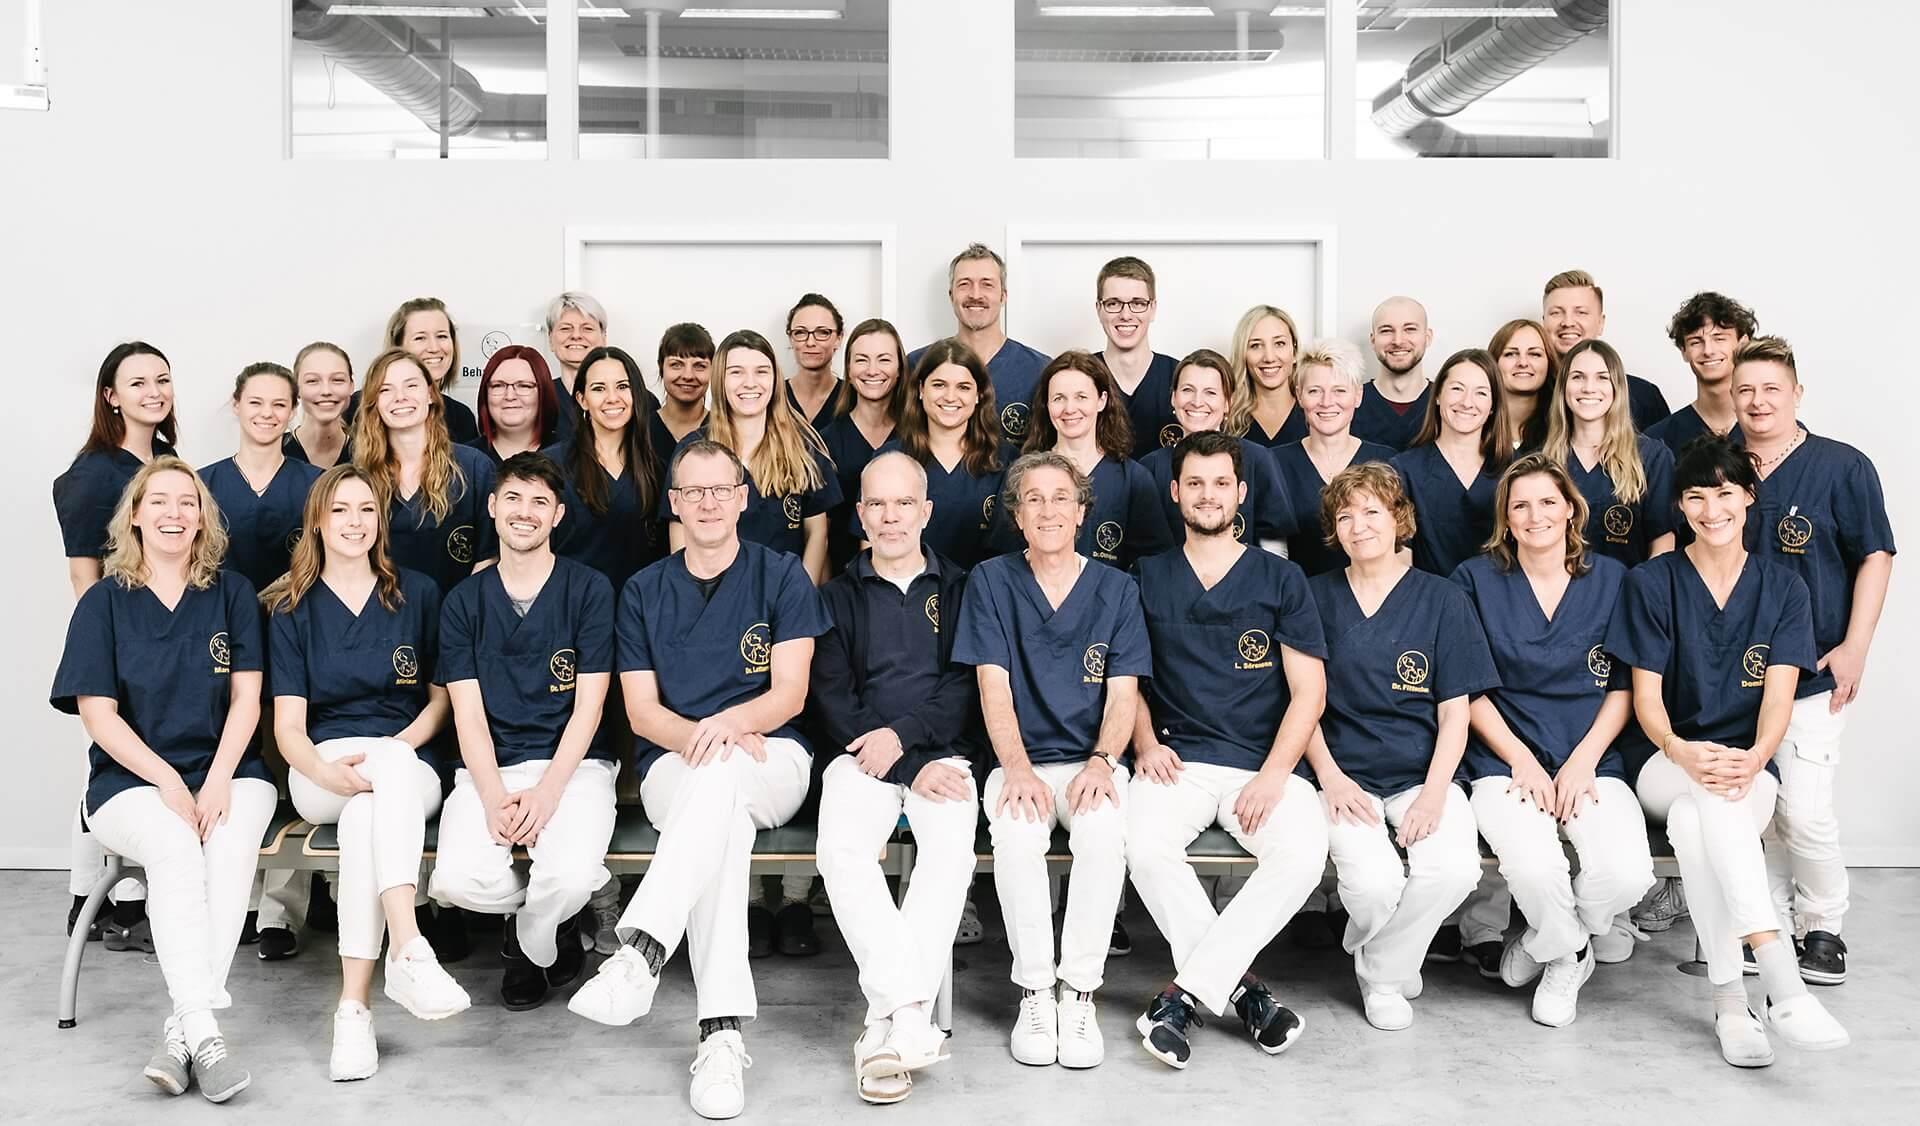 Teamfoto Tierarztpraxis Dr. Sörensen GmbH